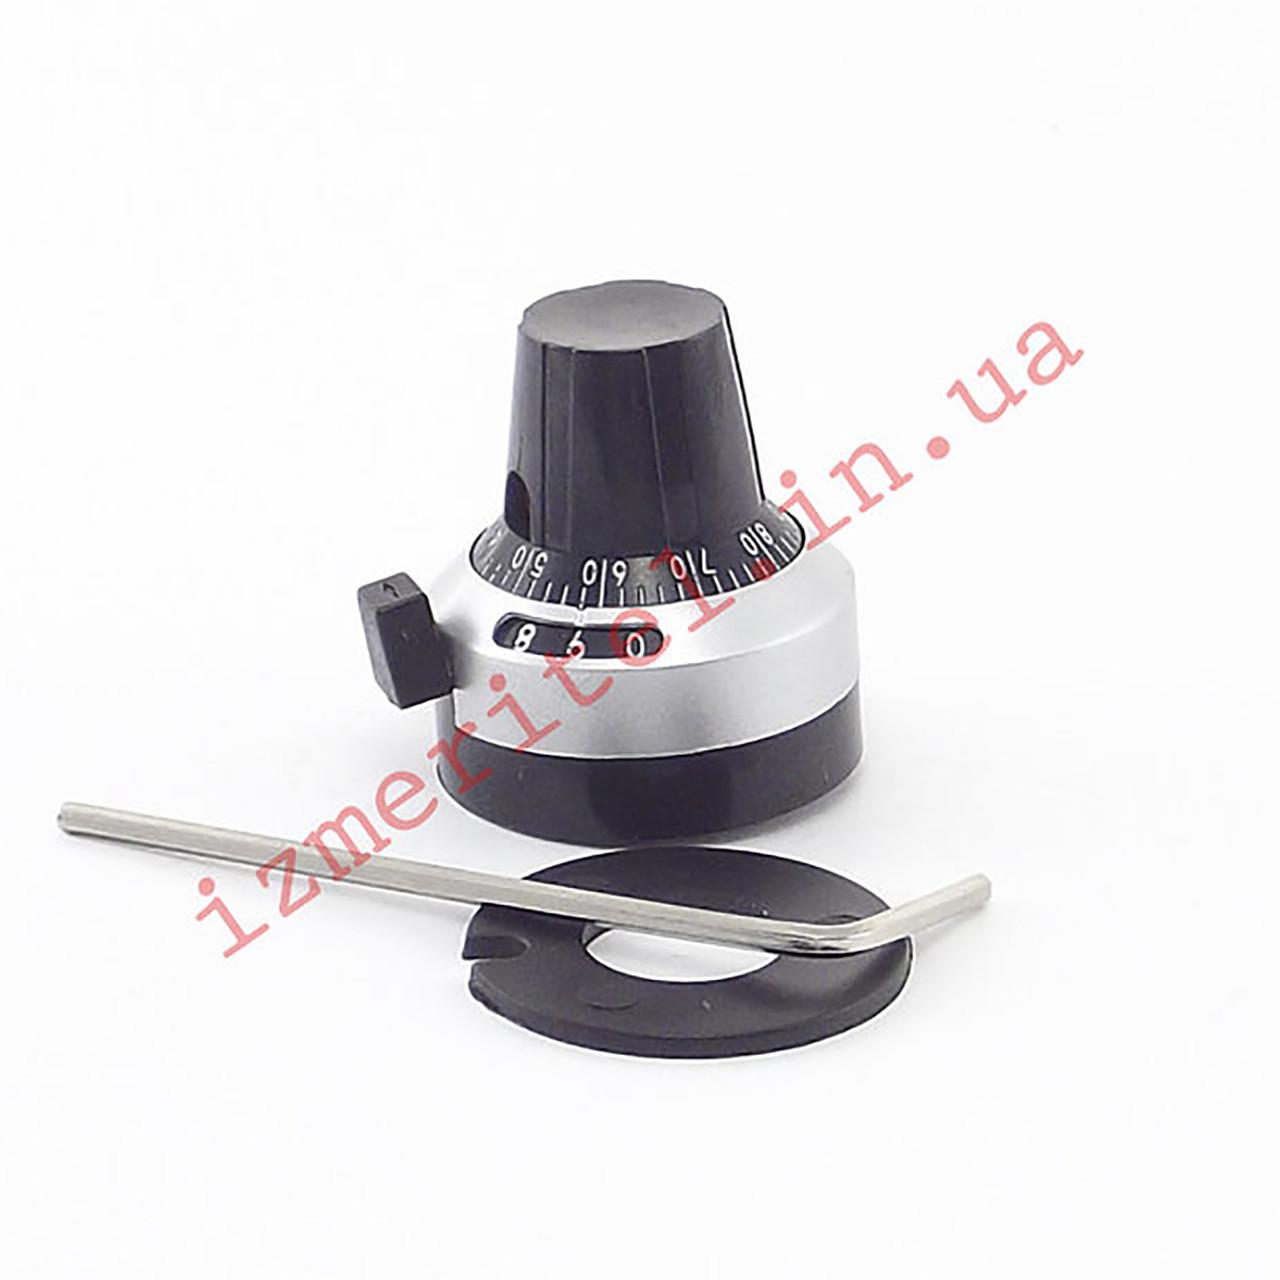 Ручка для потенциометров серии WXD3-13 3590S